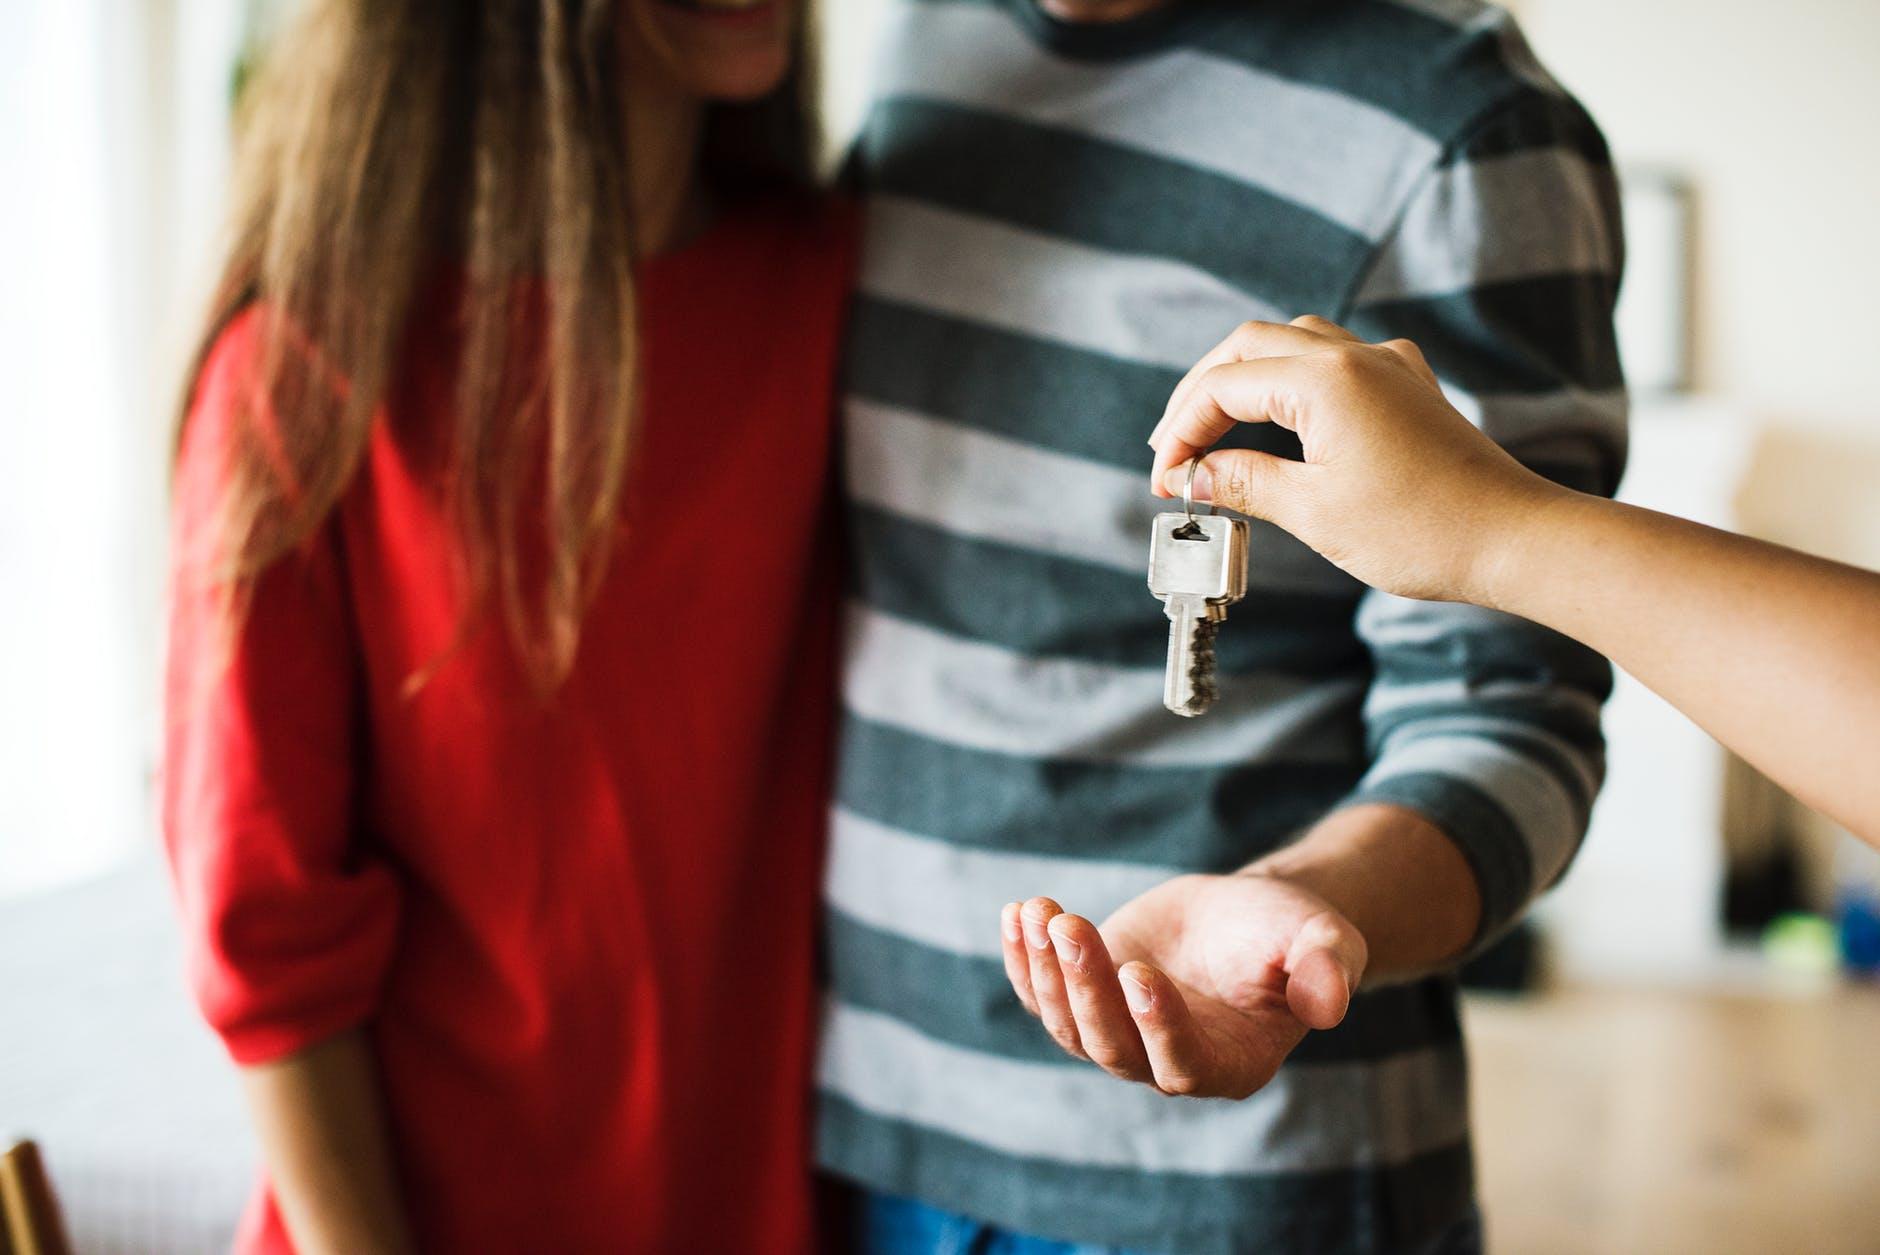 casal segurando chave